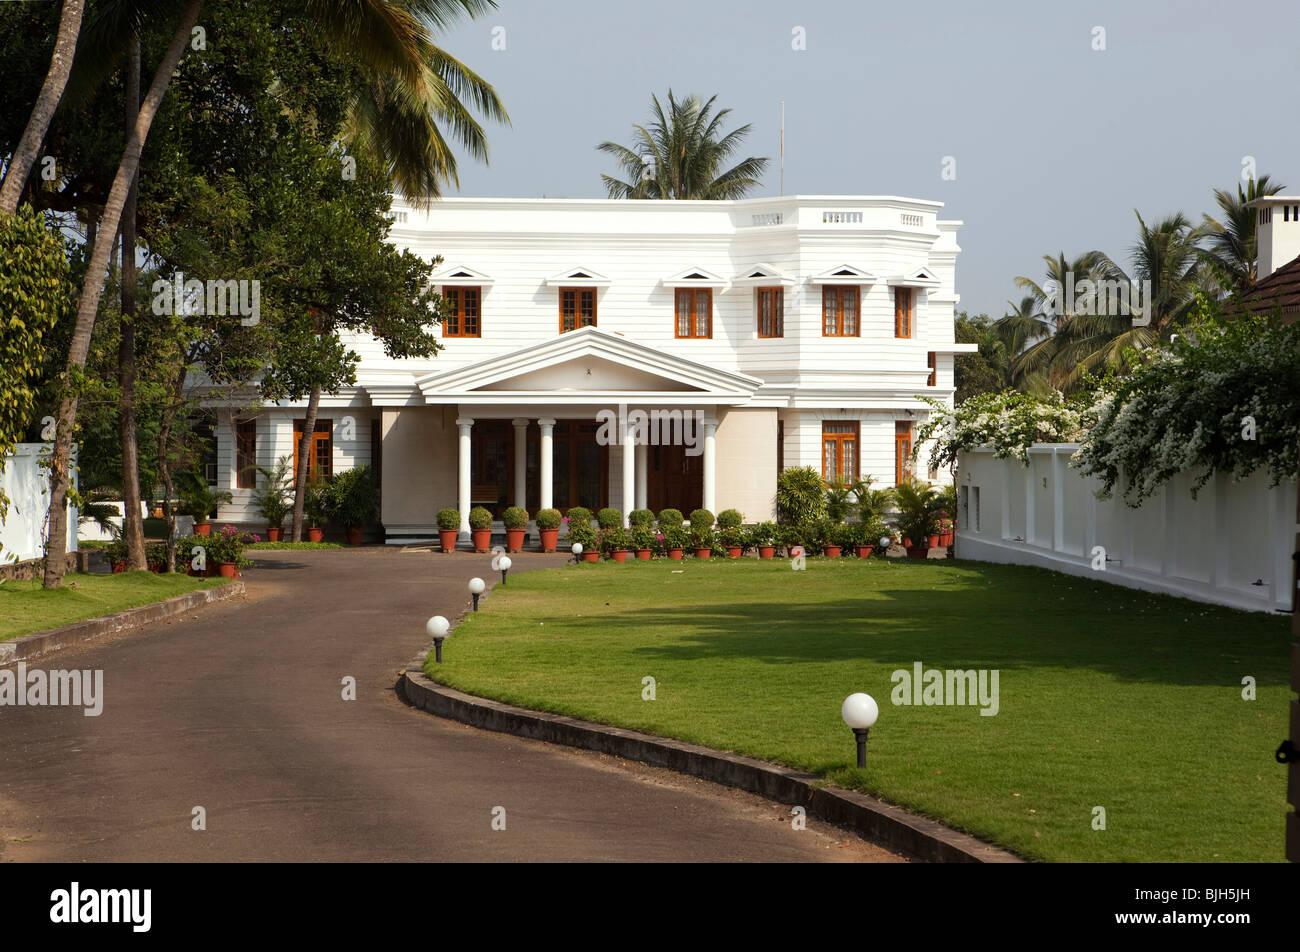 india kerala thrissur trichur fathima nagar large expensive rh alamy com